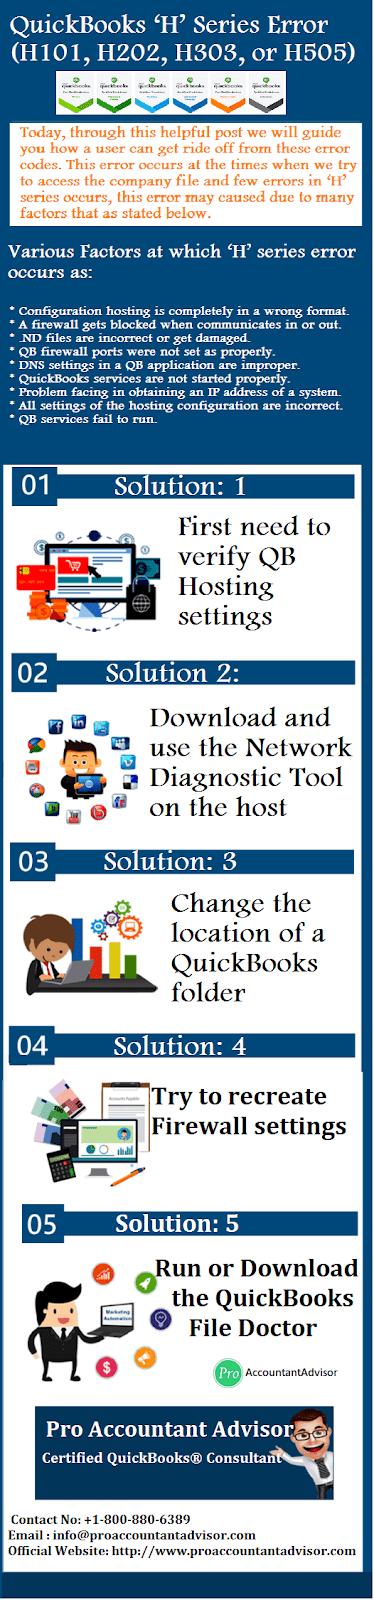 QuickBooks H Series Error (H101, H202, H303, or H505) Codes -Pro Accountant Advisor (Infographic)